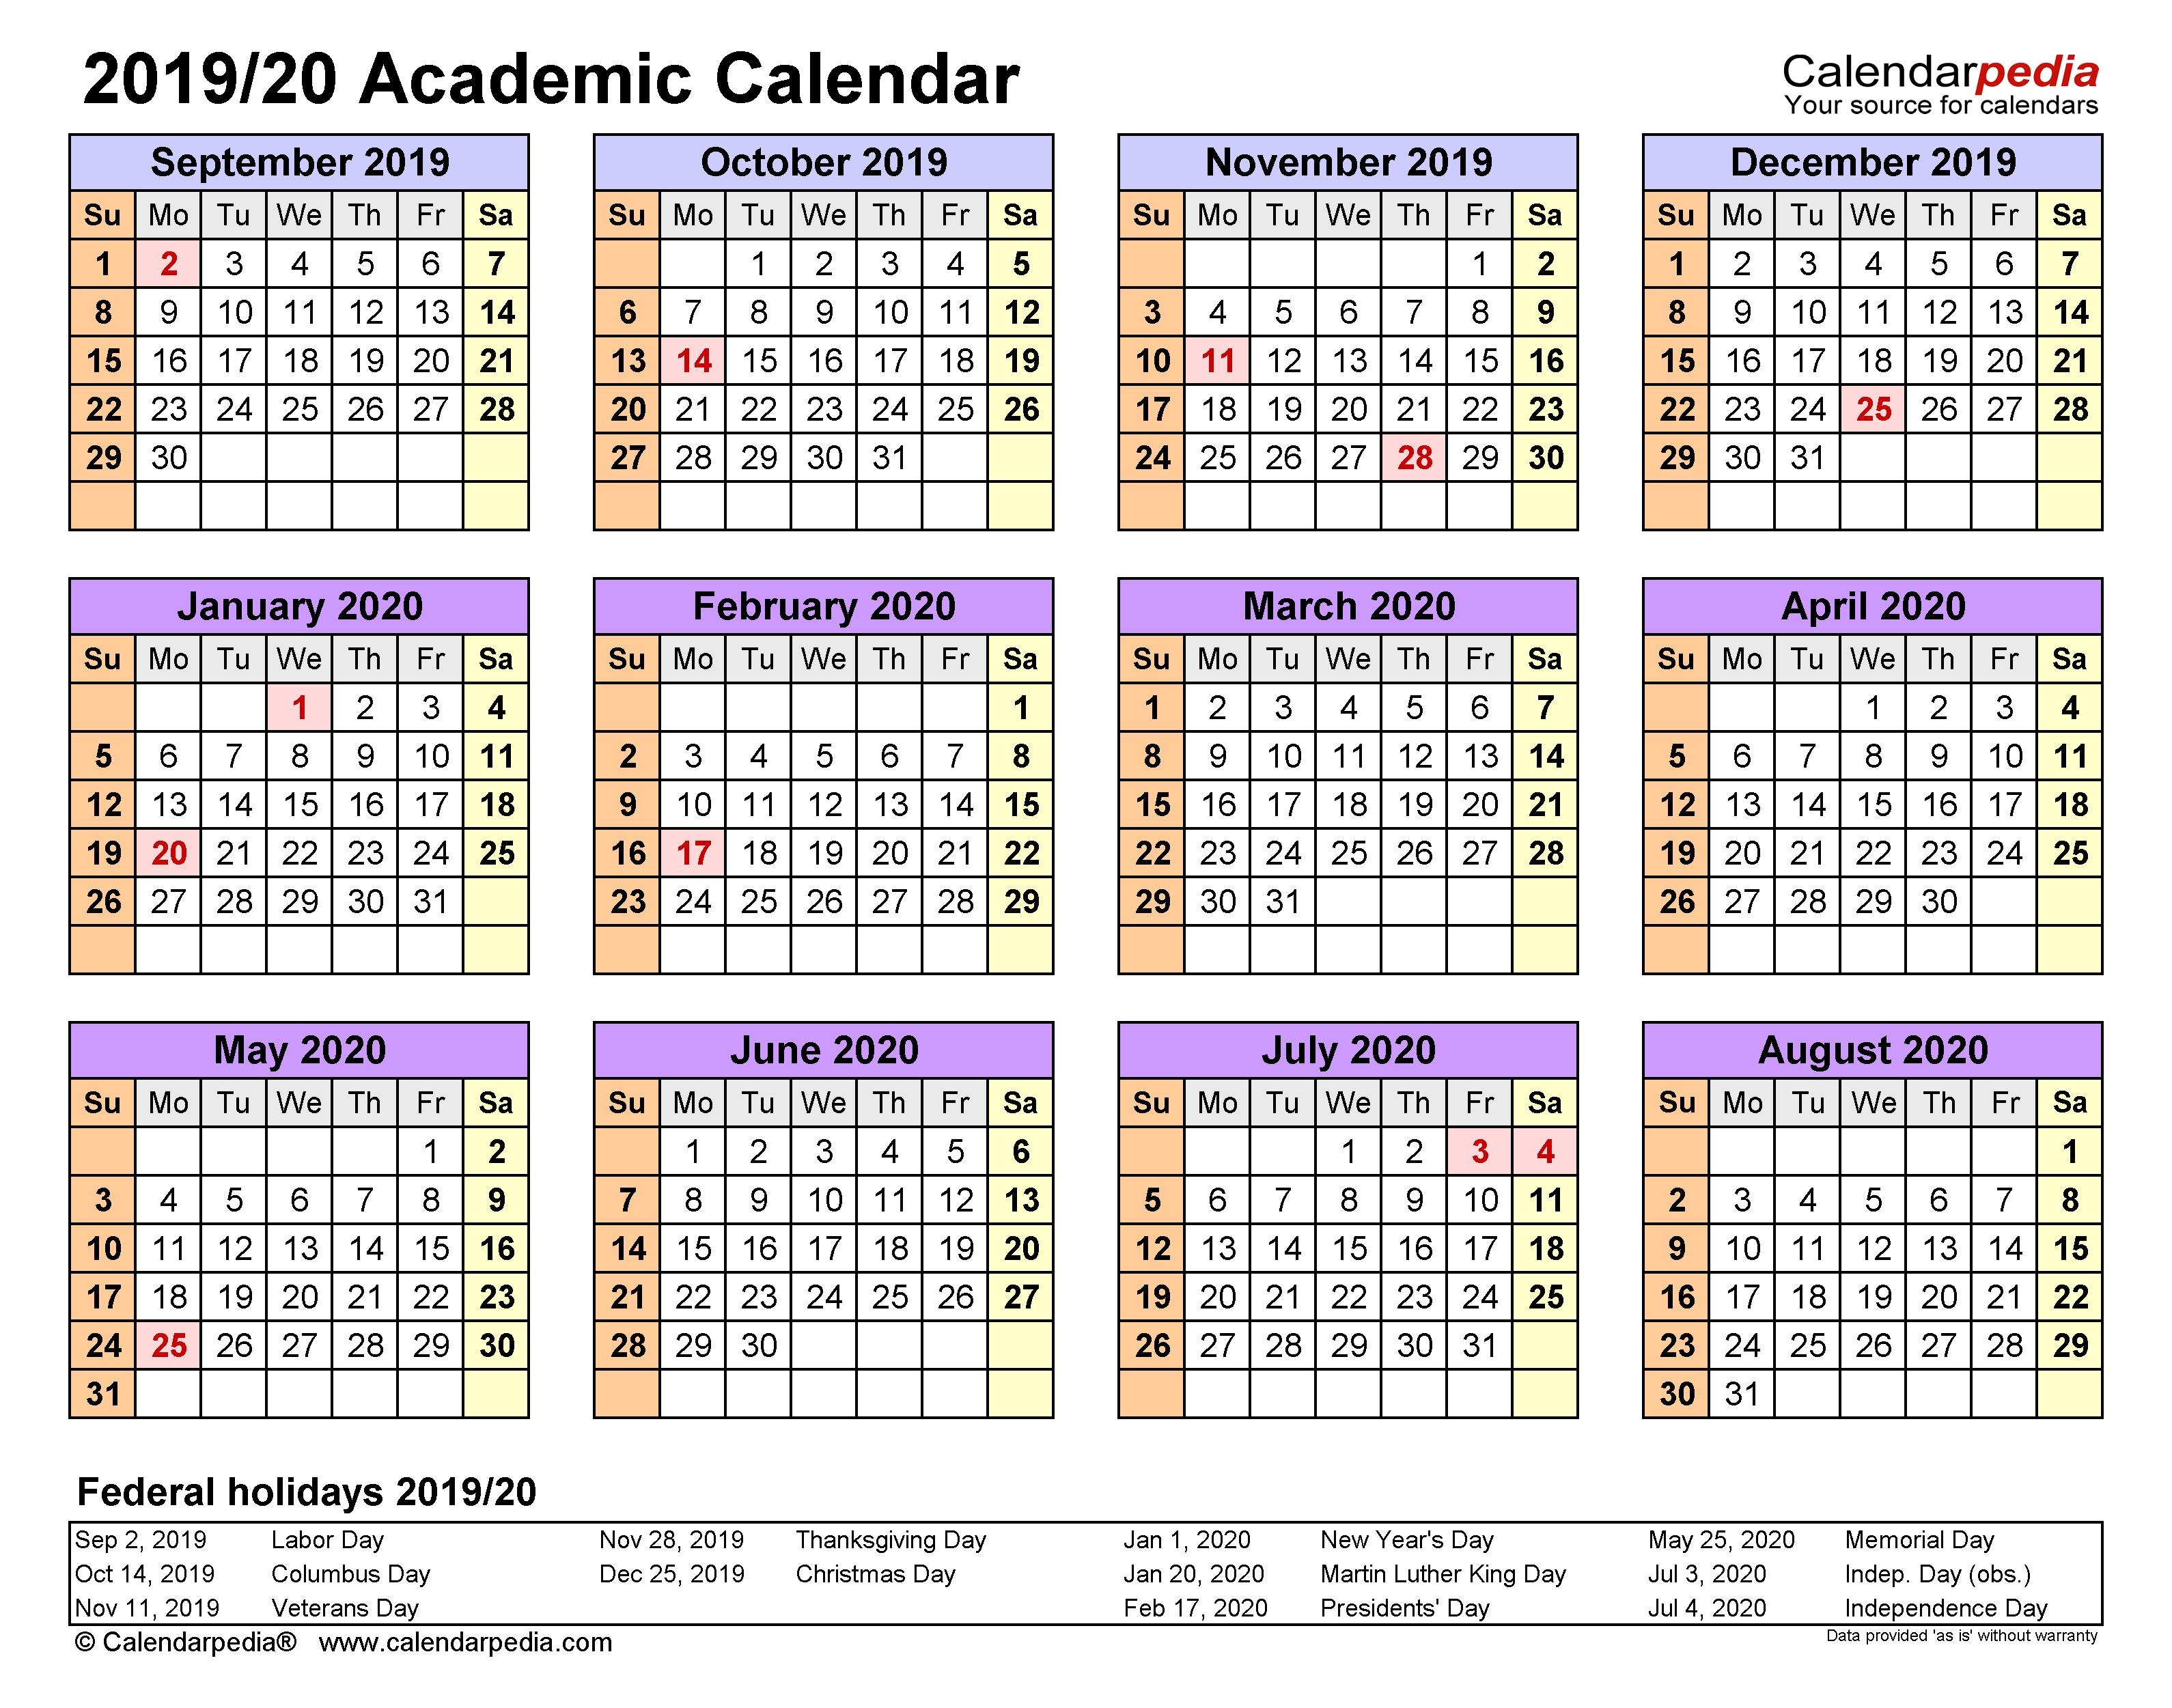 Academic Calendars 2019/2020 - Free Printable Word Templates with regard to Free Printable Academic Calendar 2019-2020